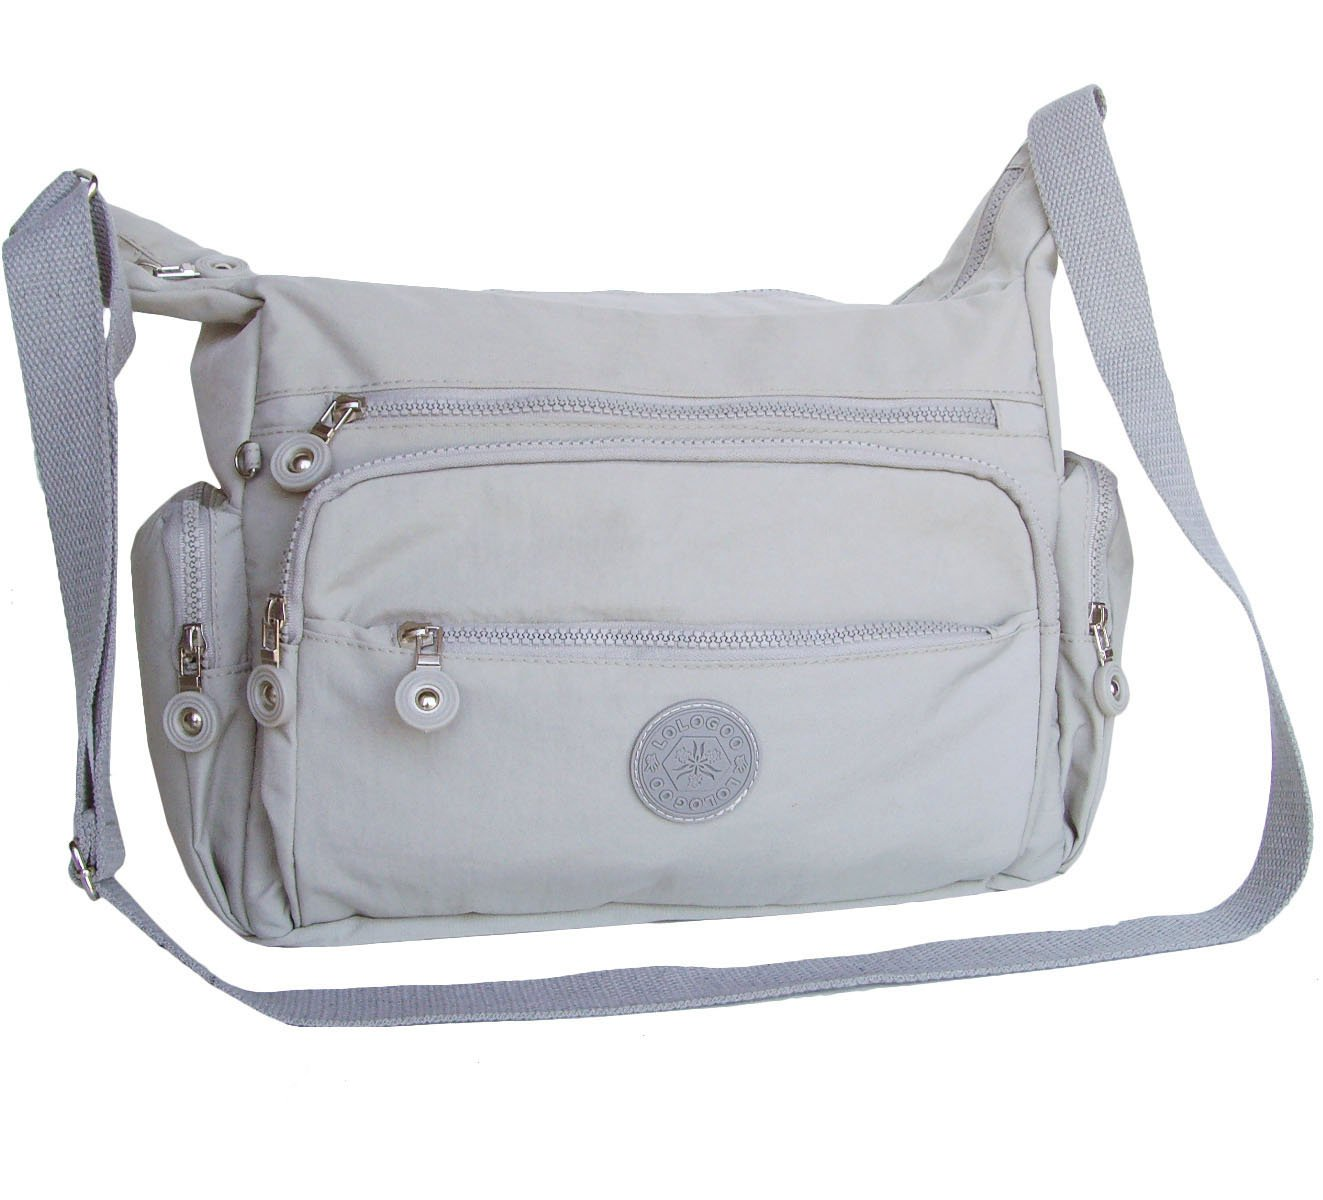 HONG YE Pure Stripe Slouch Bag,sku:hb78lightgreen1